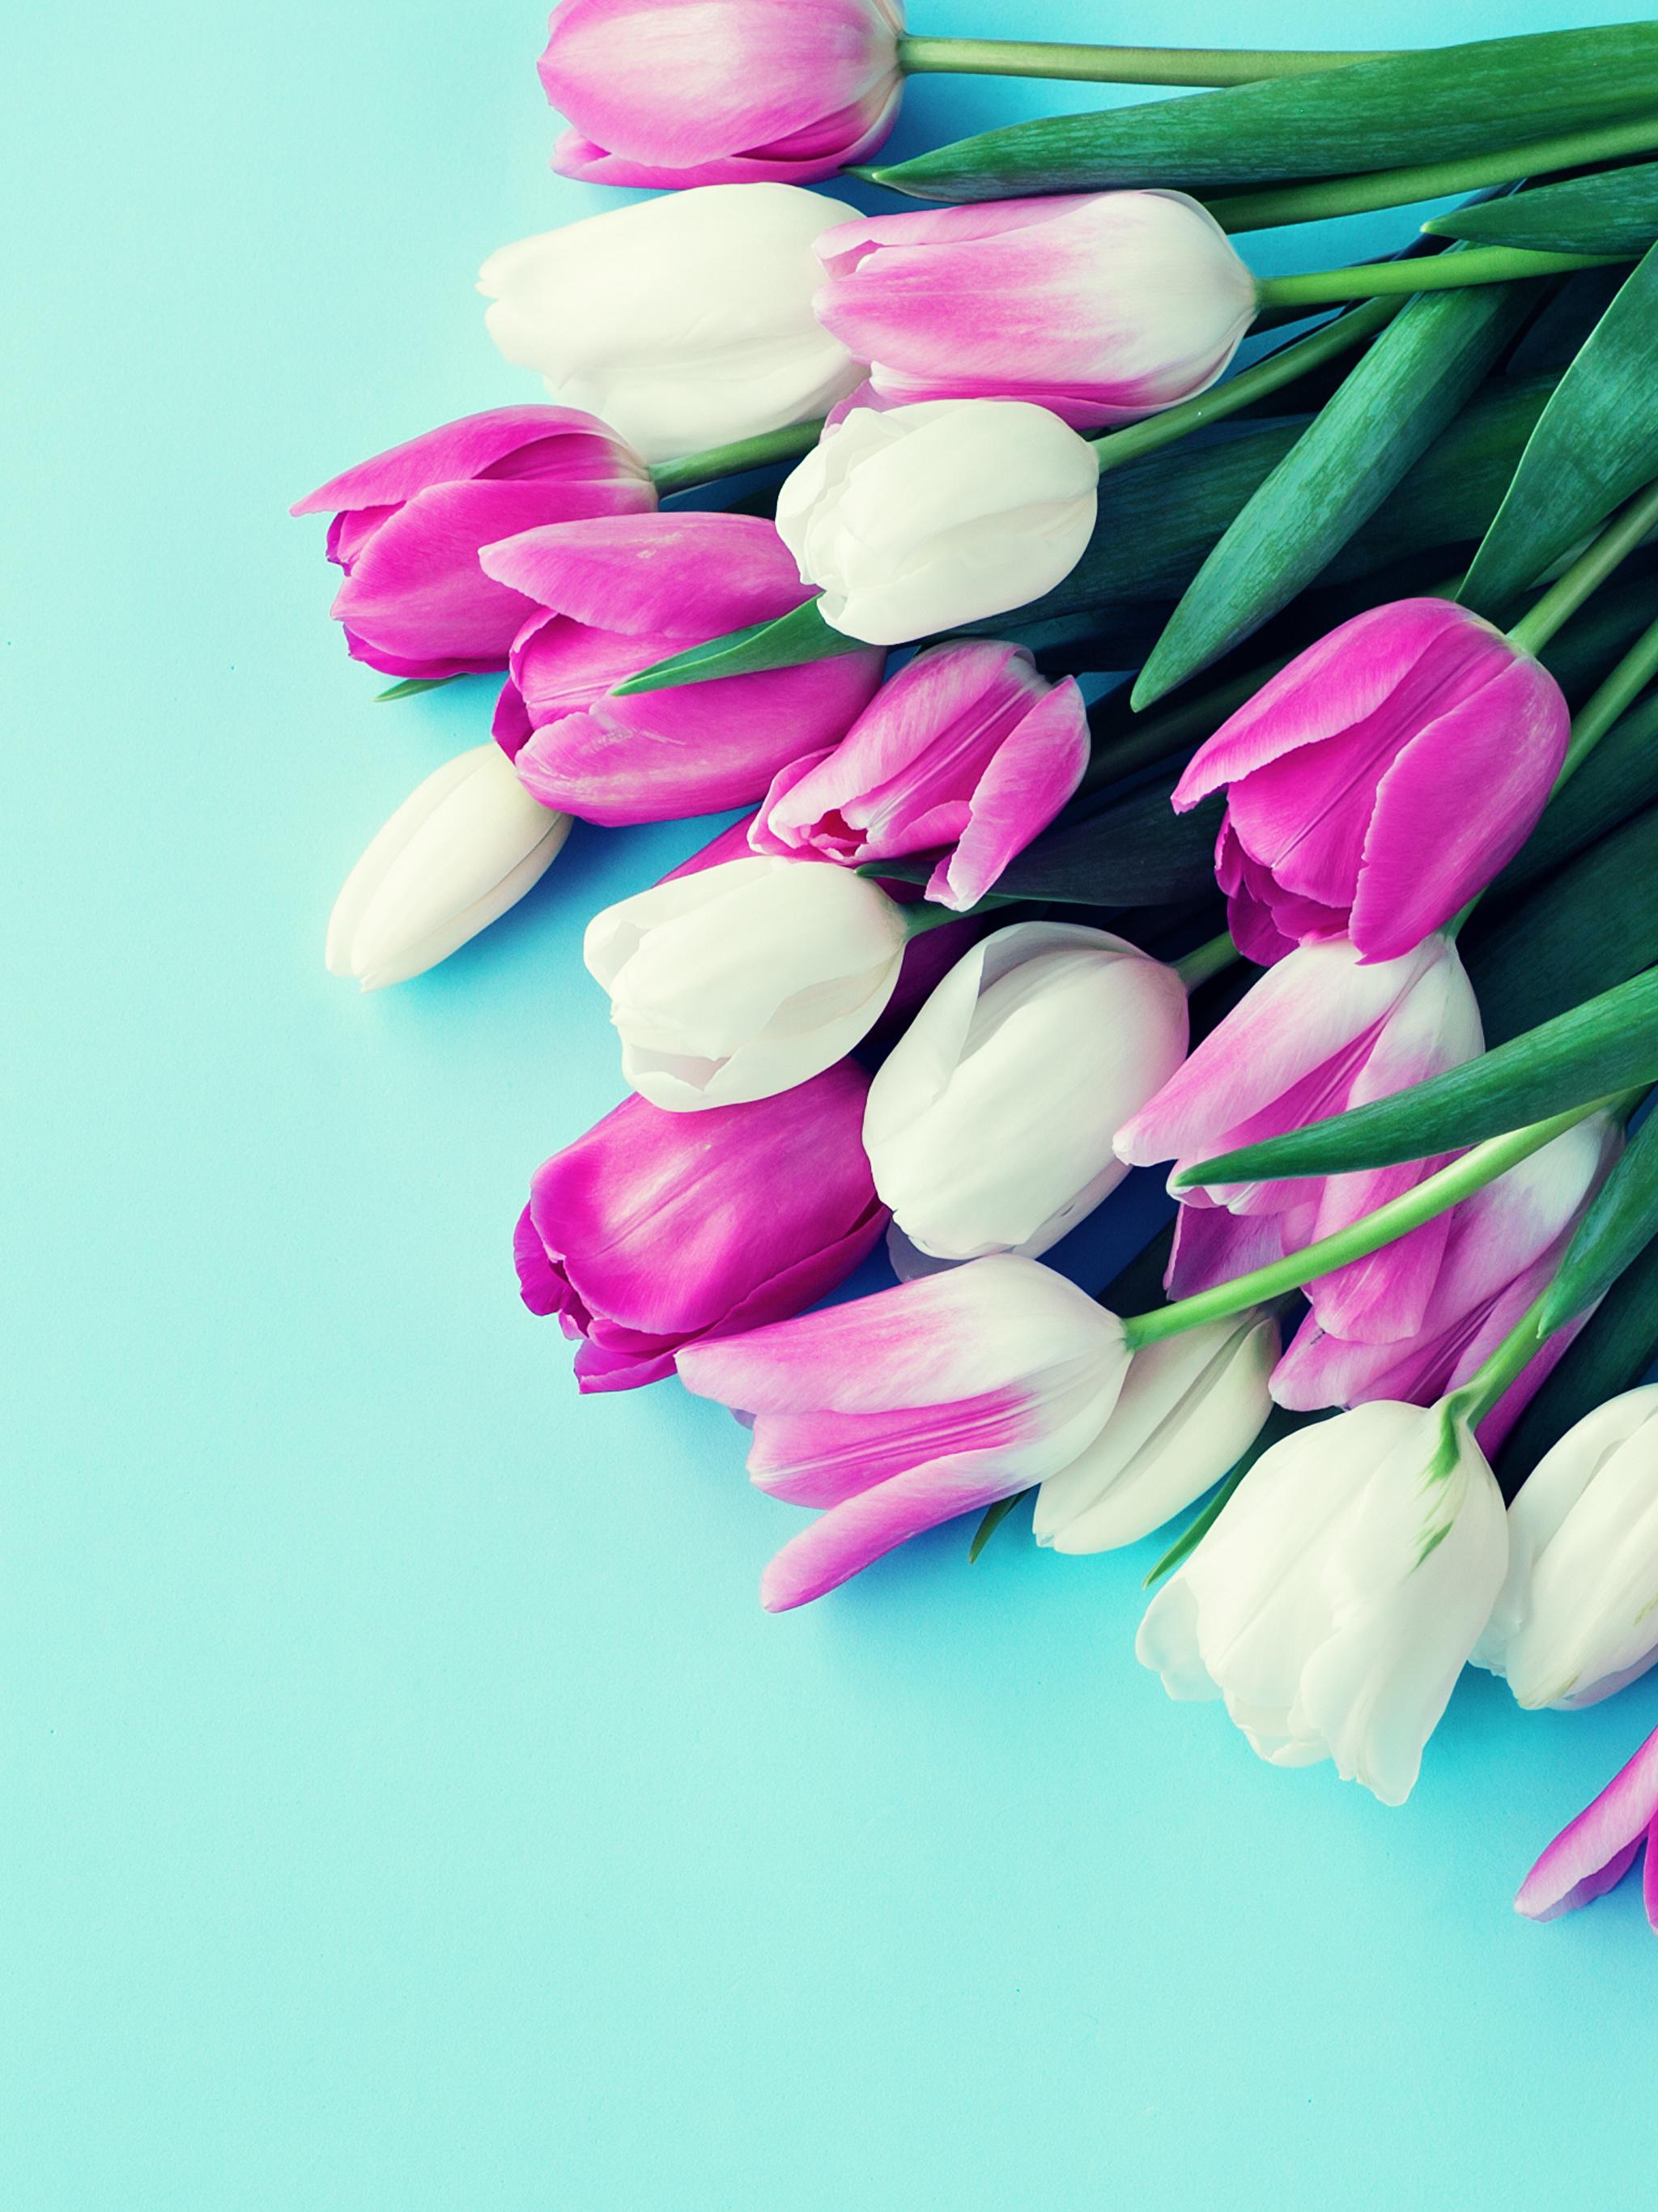 Картинки тюльпанов на заставку телефона